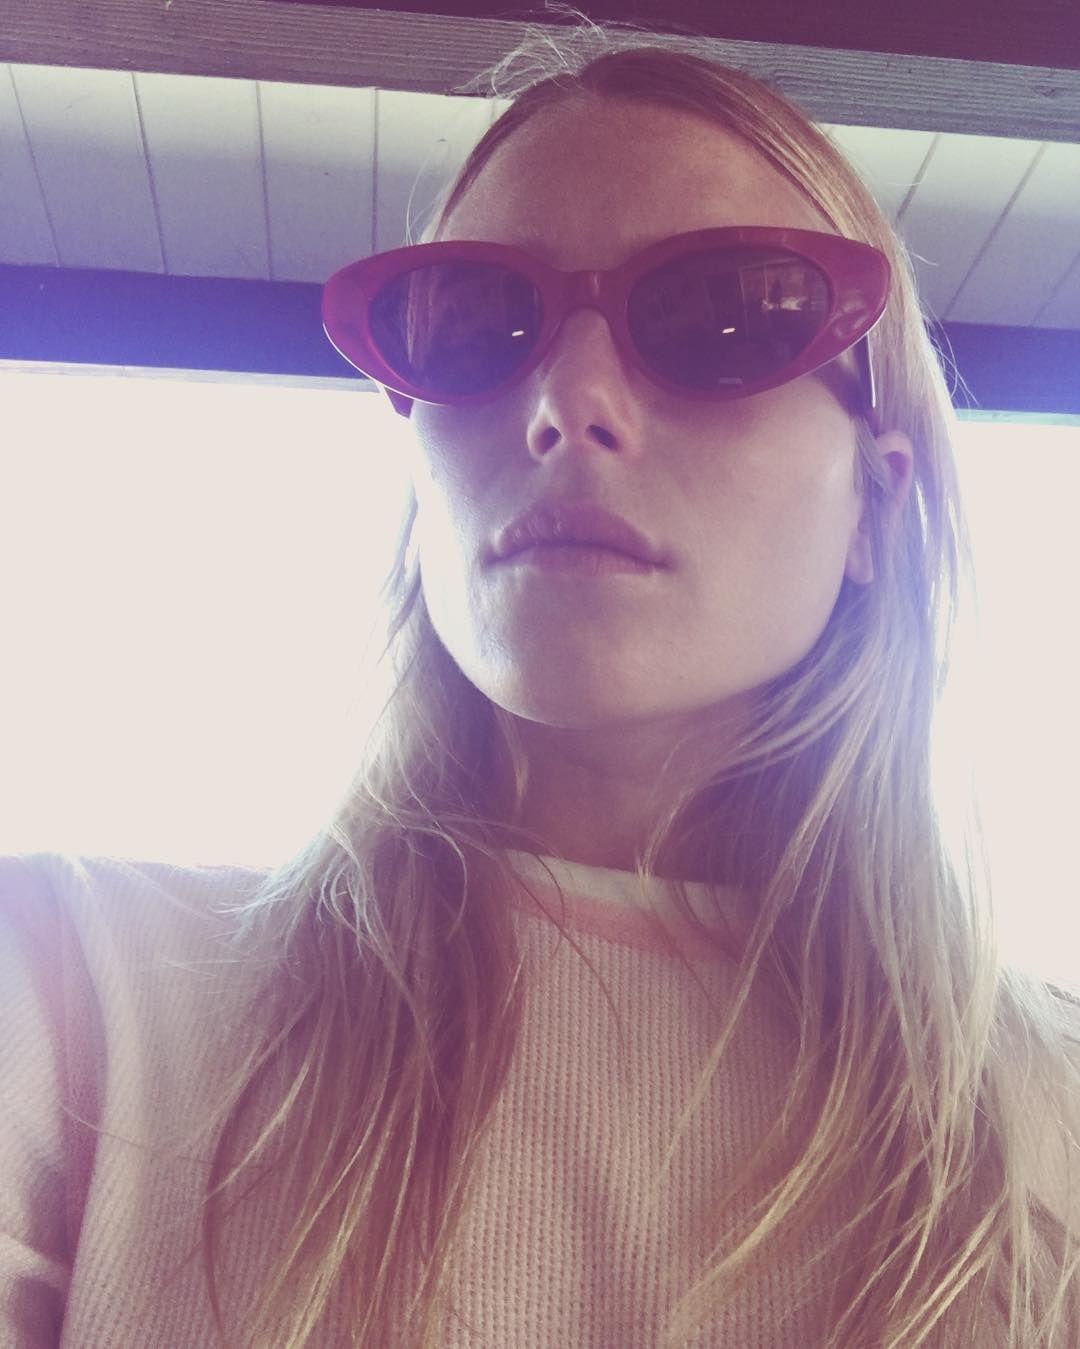 Selfie Dree Hemingway naked (21 foto and video), Pussy, Bikini, Instagram, butt 2020